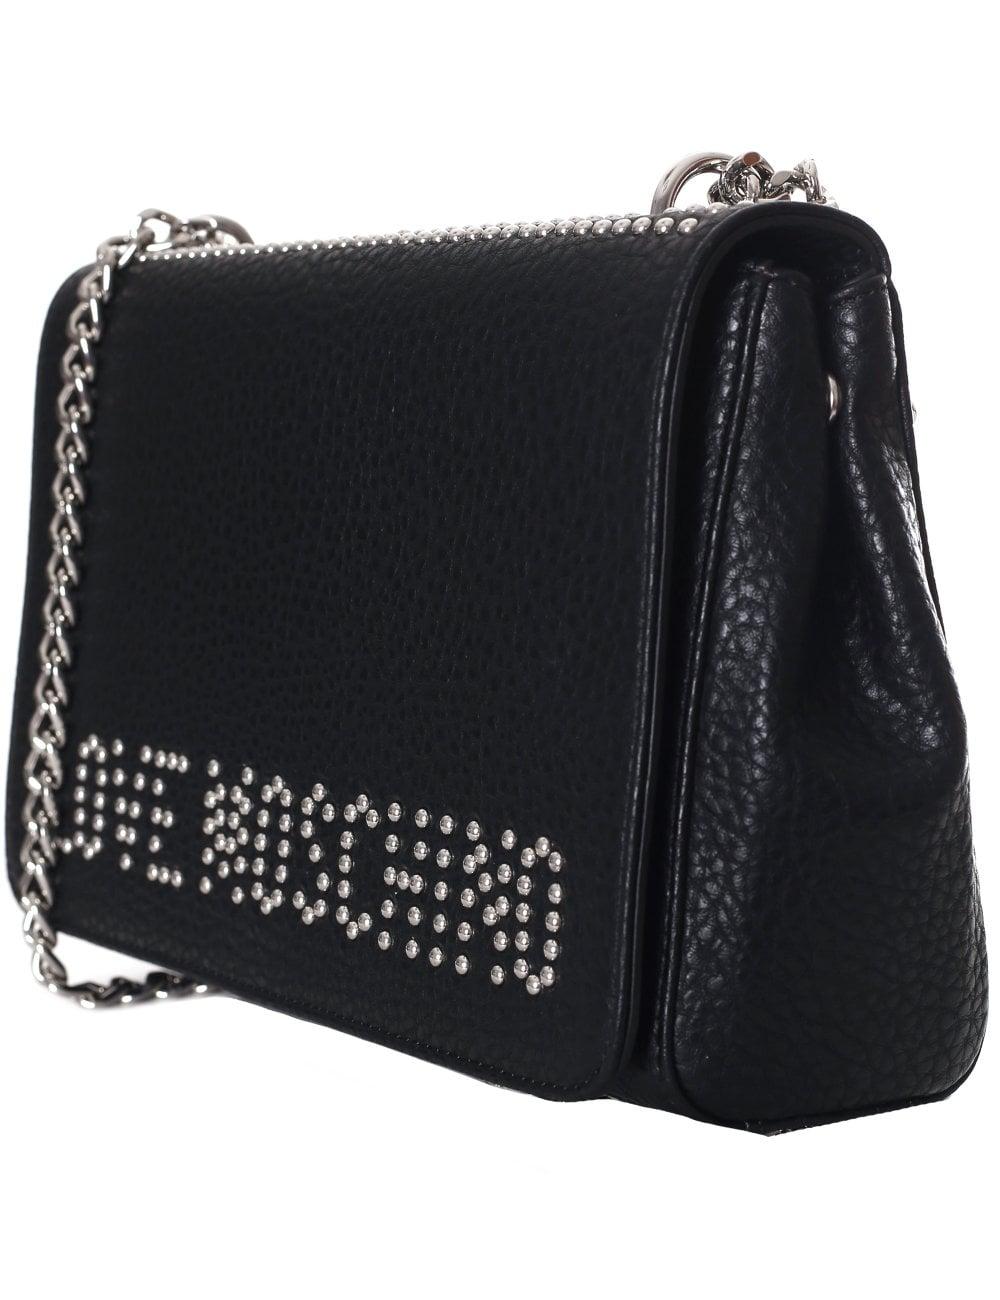 27f3602610f1 Love Moschino Women s Studded Logo Chain Shoulder Bag